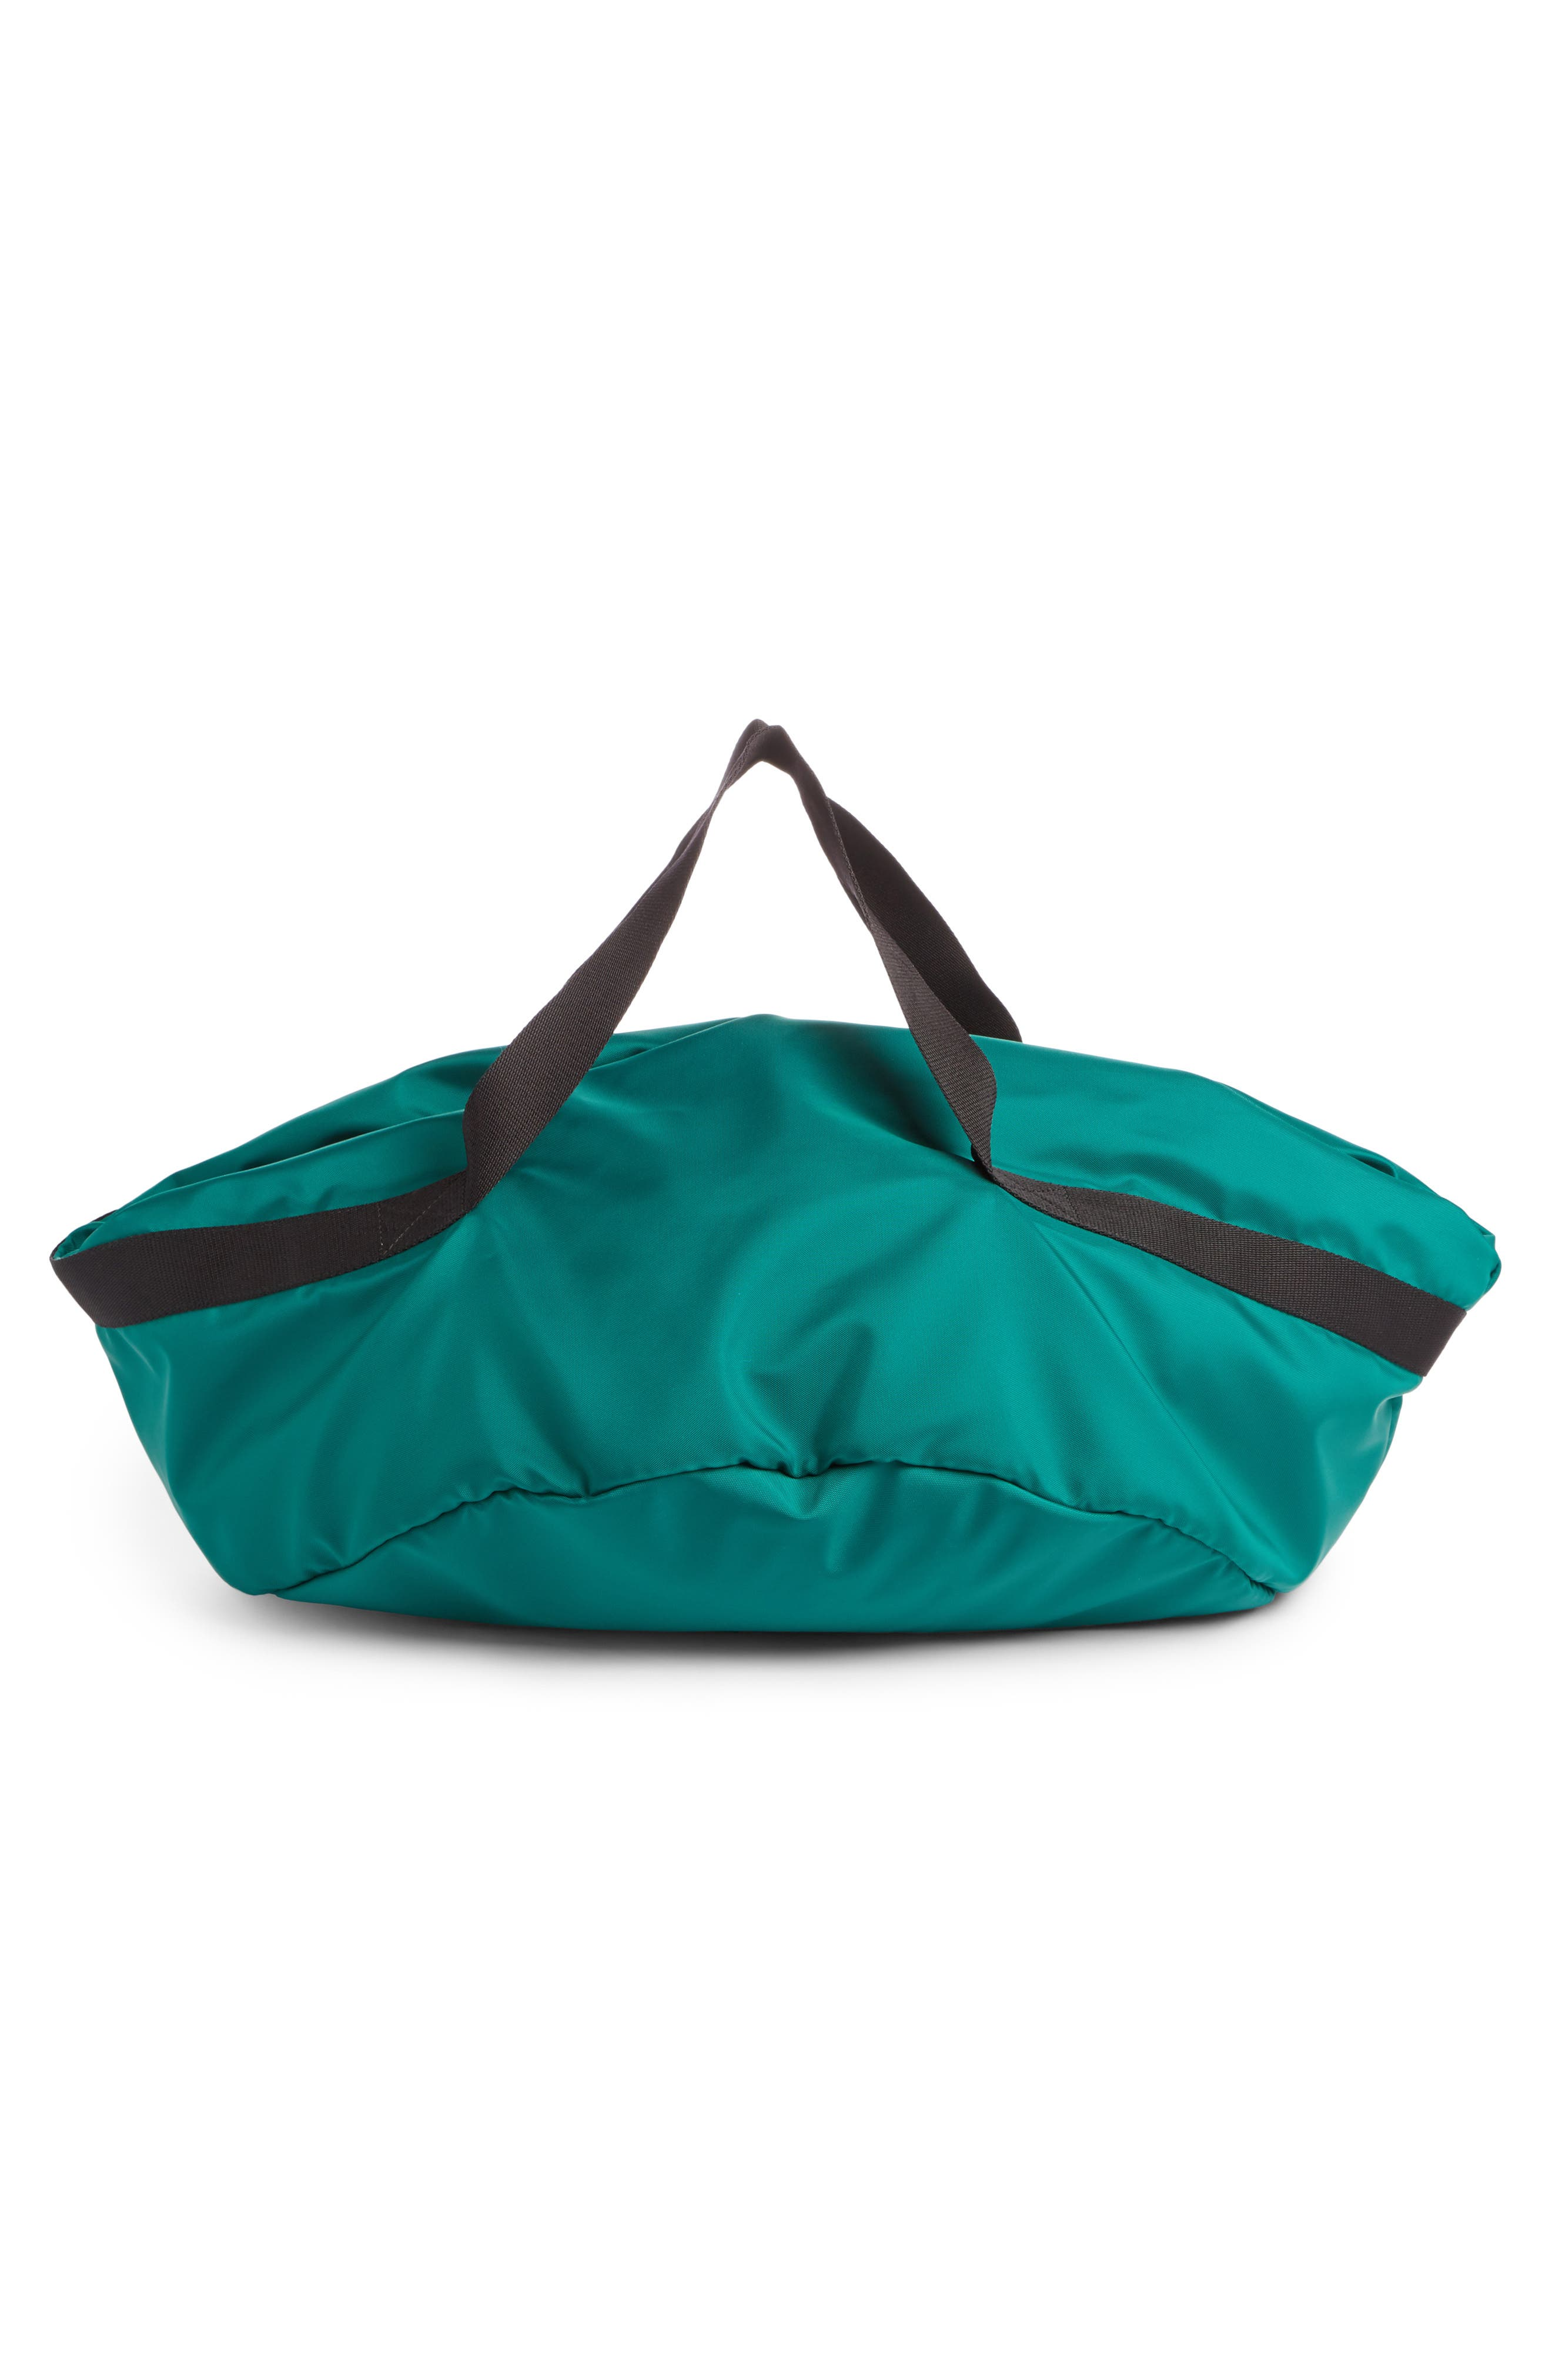 Small Wheel Bag,                             Alternate thumbnail 2, color,                             Vert Emeraude/ Noir